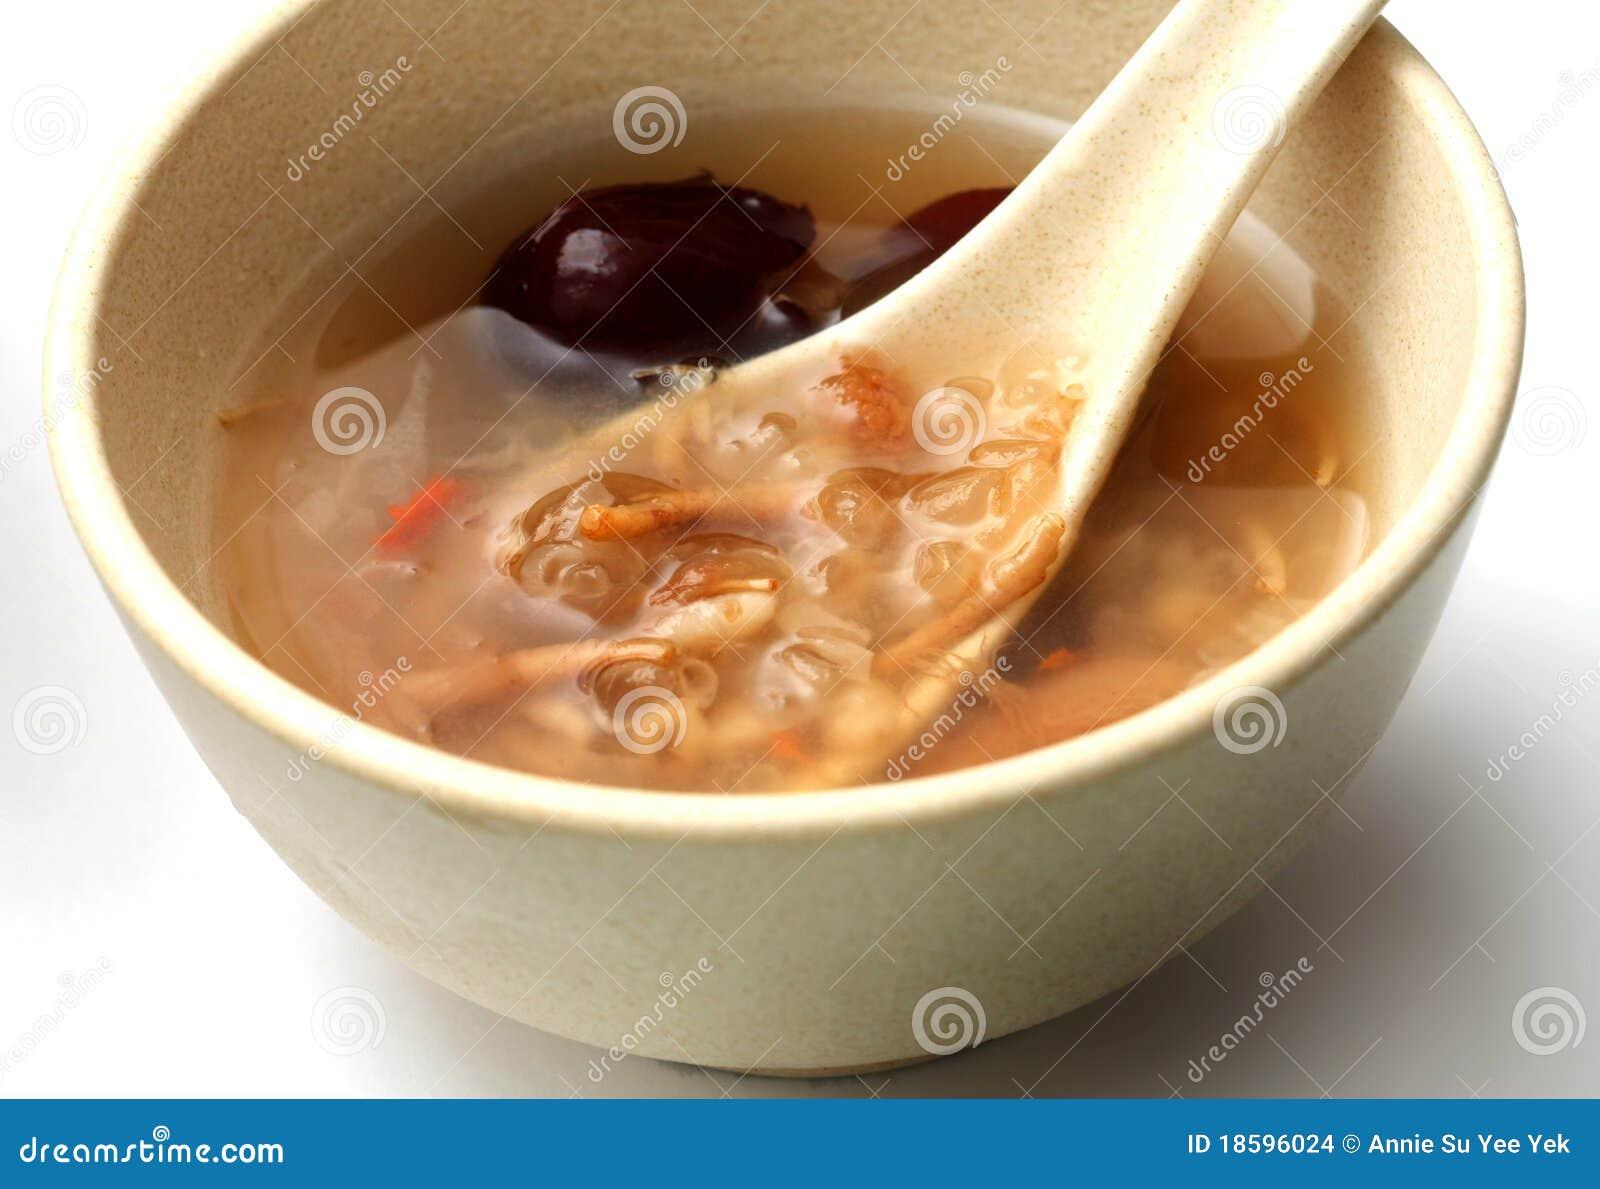 how to make chinese dessert